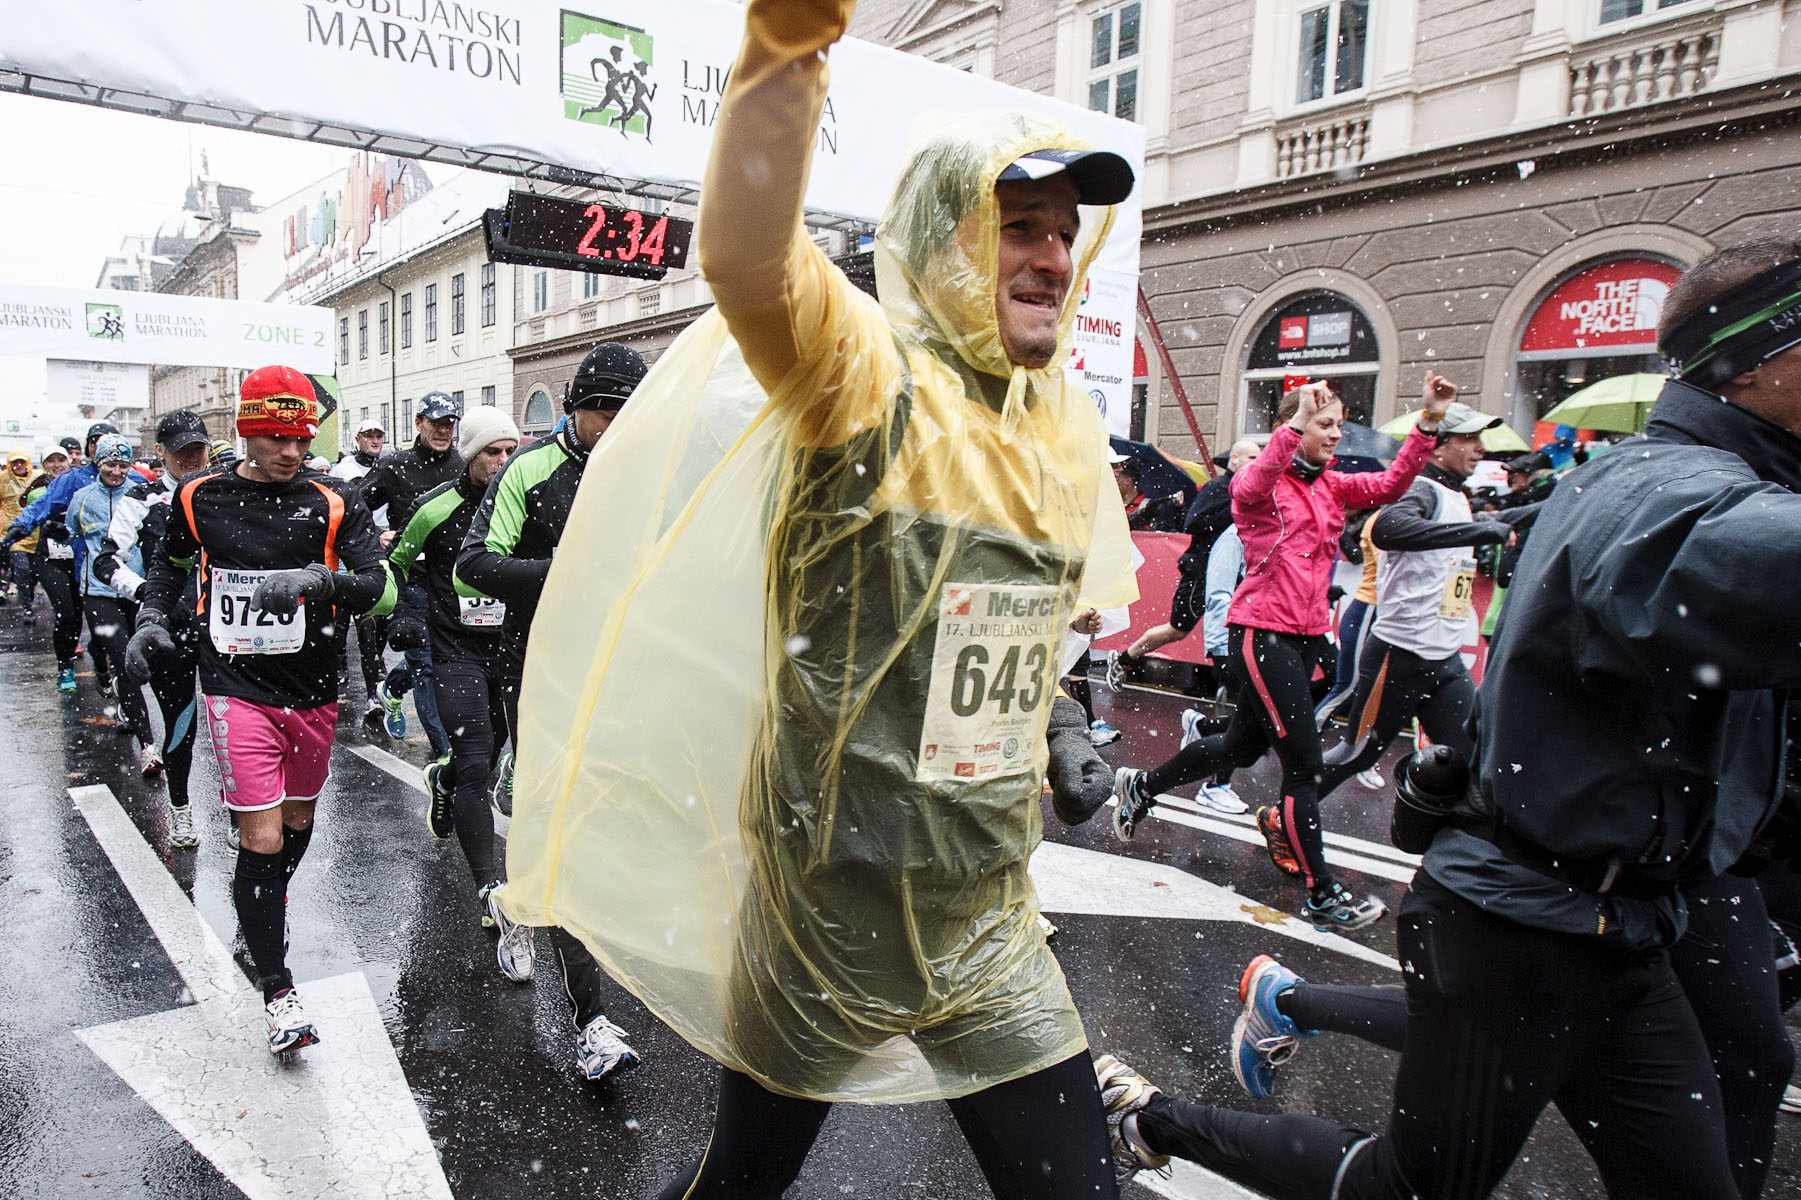 Athletes compete in the 17th International Ljubljana Marathon on Oct 28, 2012 in Ljubljana, Slovenia.